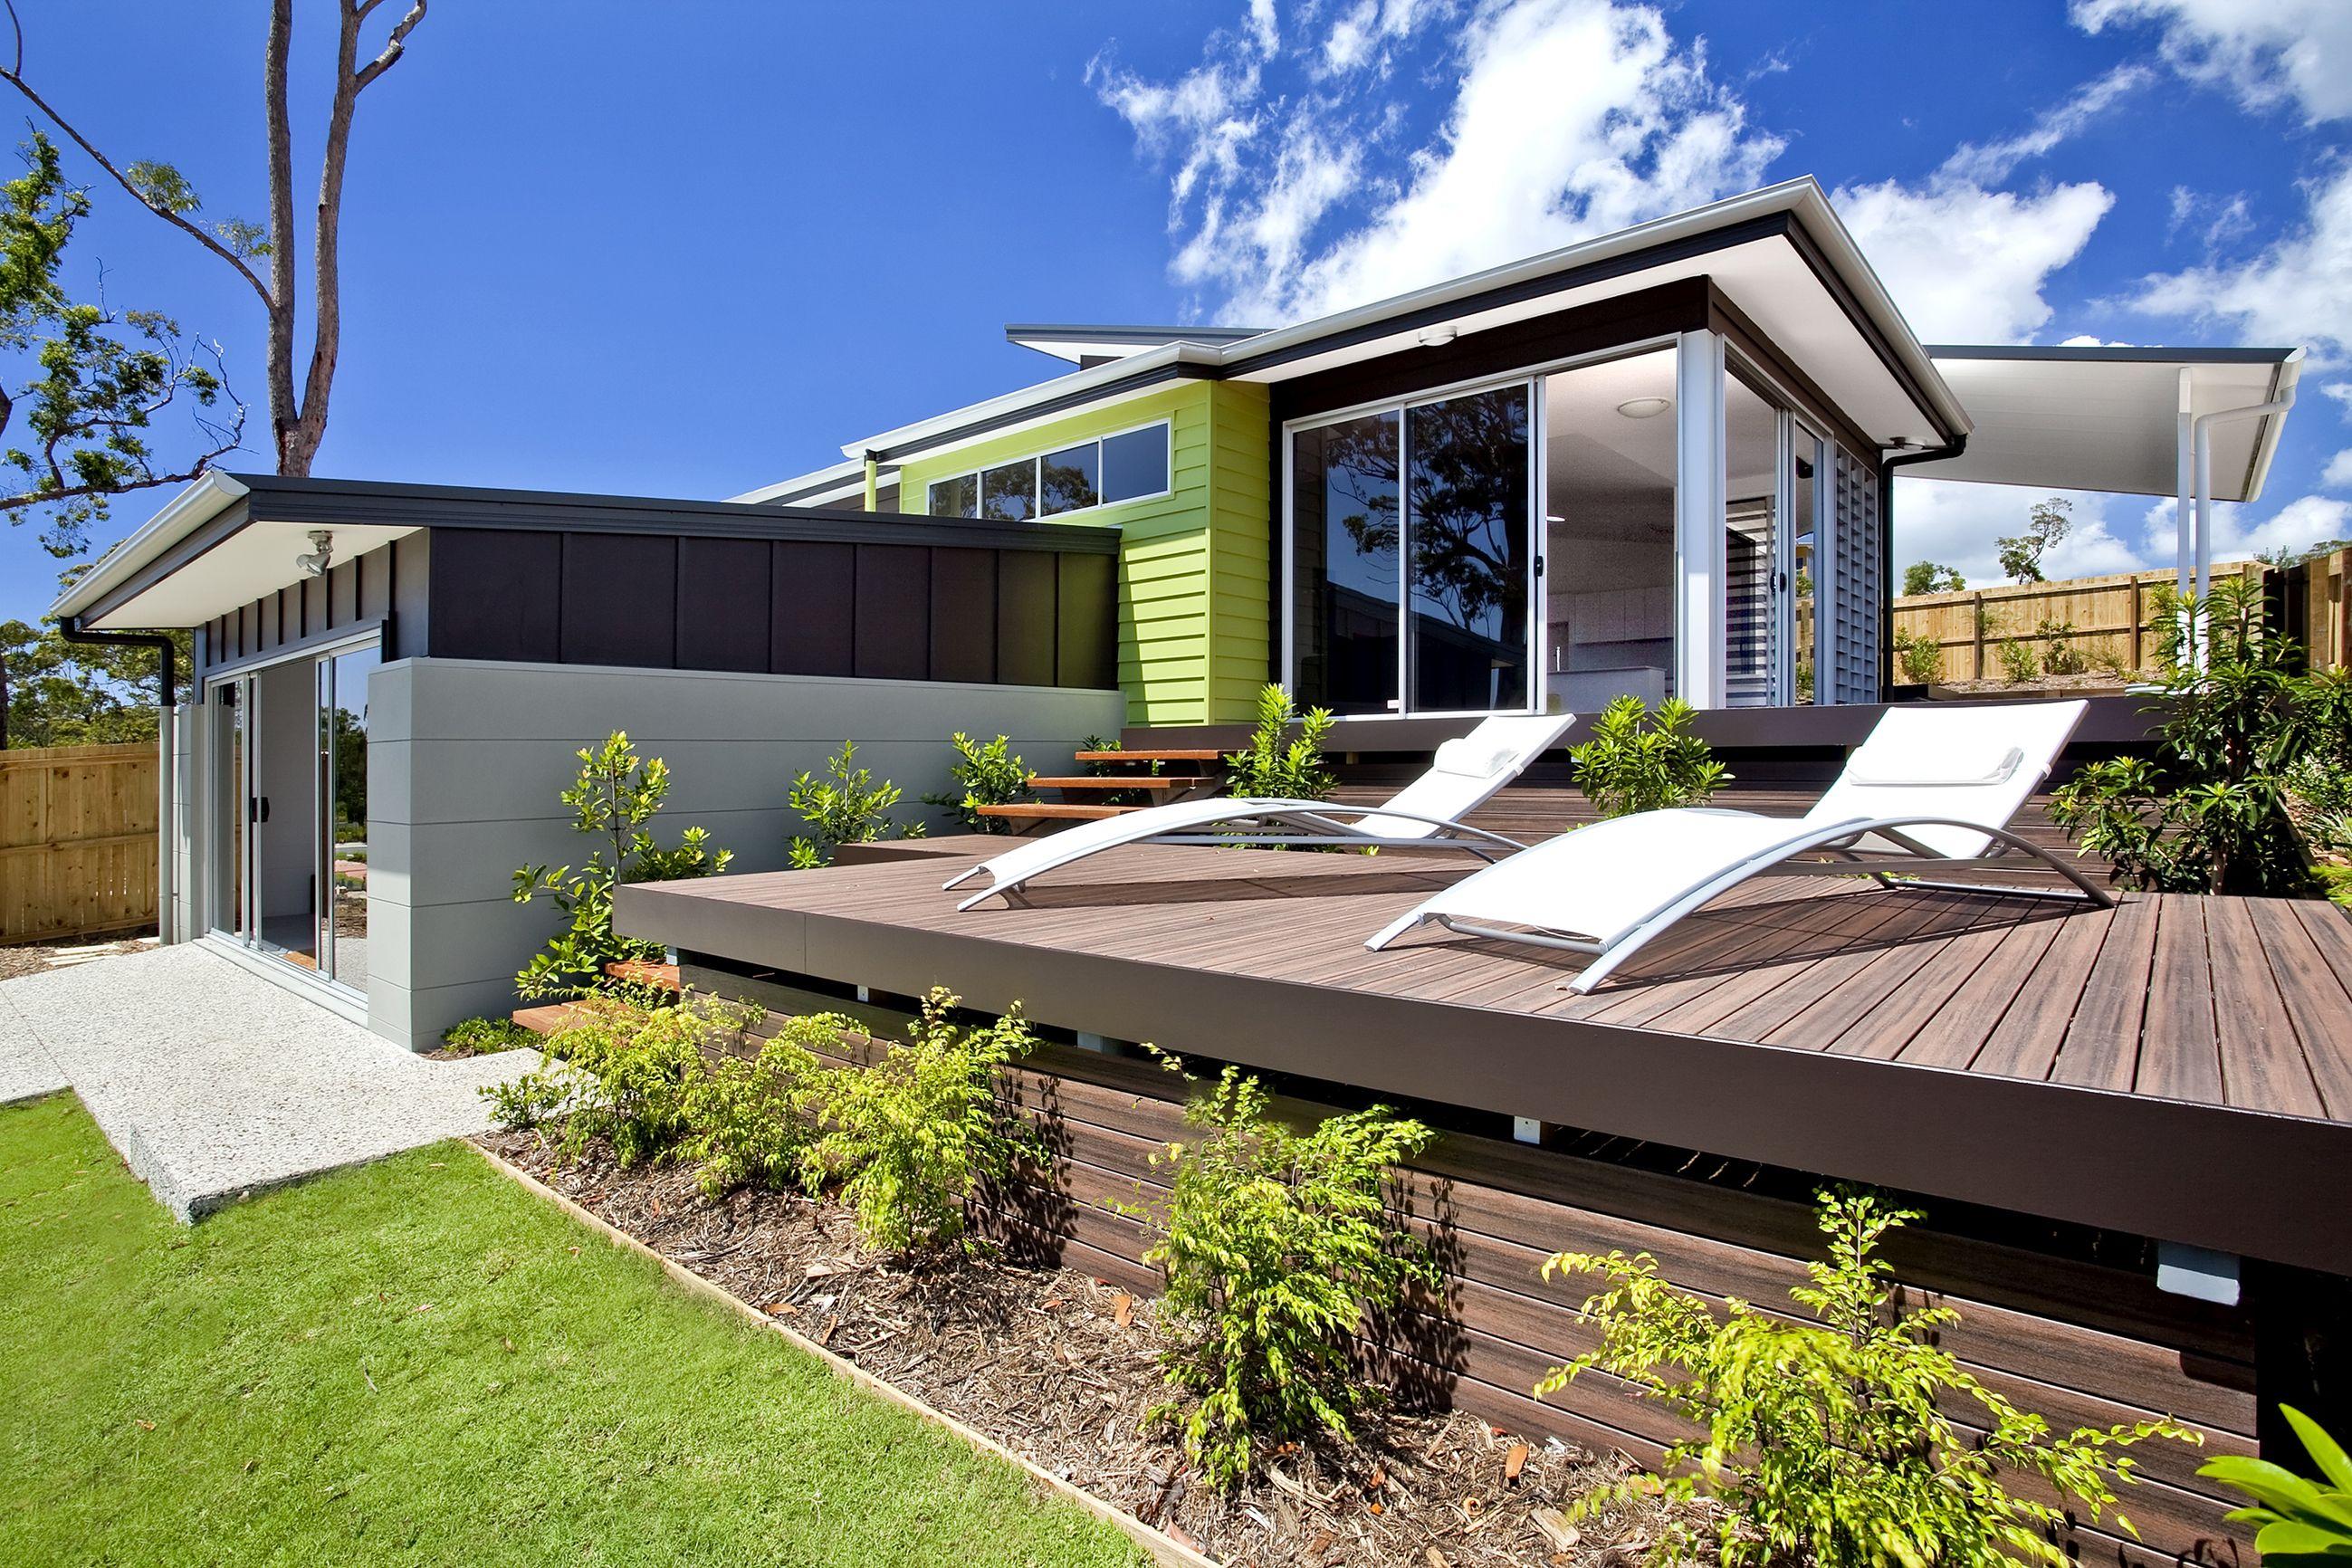 wpc decking price malaysia,lightweight concrete deck tiles